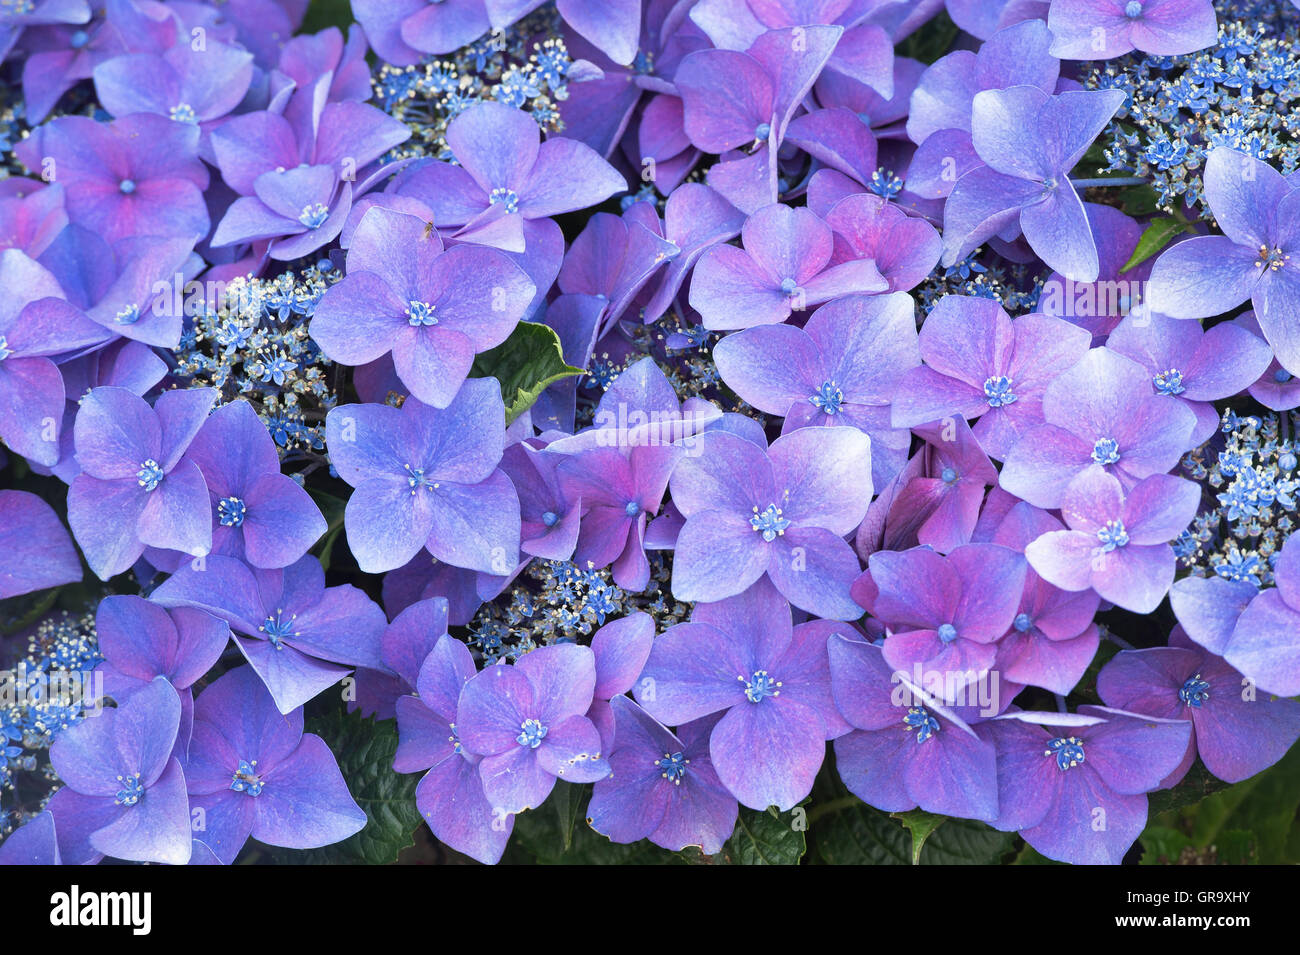 Hydrangea Macrophylla 'Kardinal violet' flowers pattern. Stock Photo